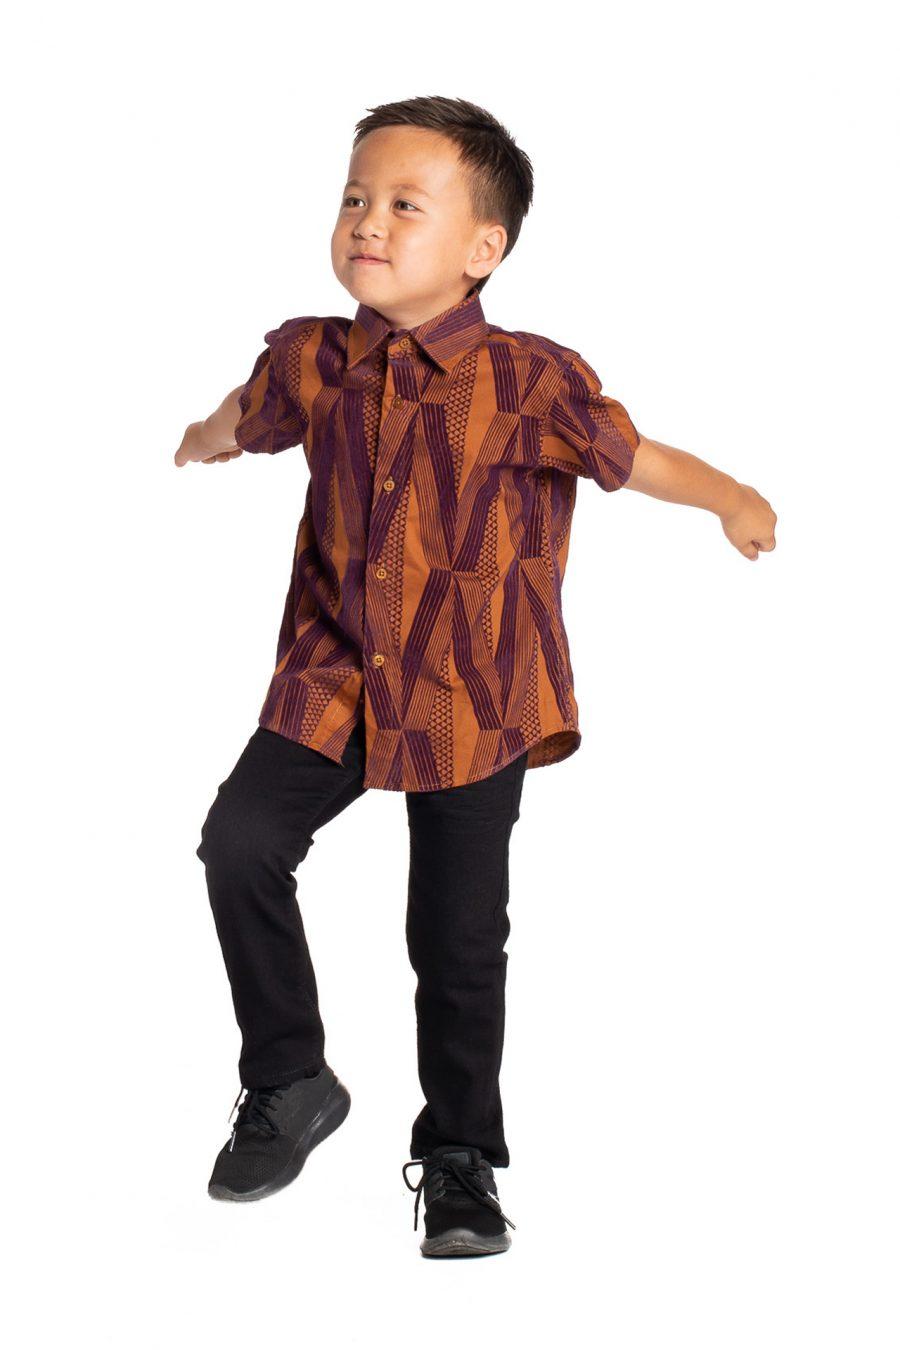 Boy wearing Keiki Aloha Short Sleeve in Red Mahagony Kanaloa - Side View